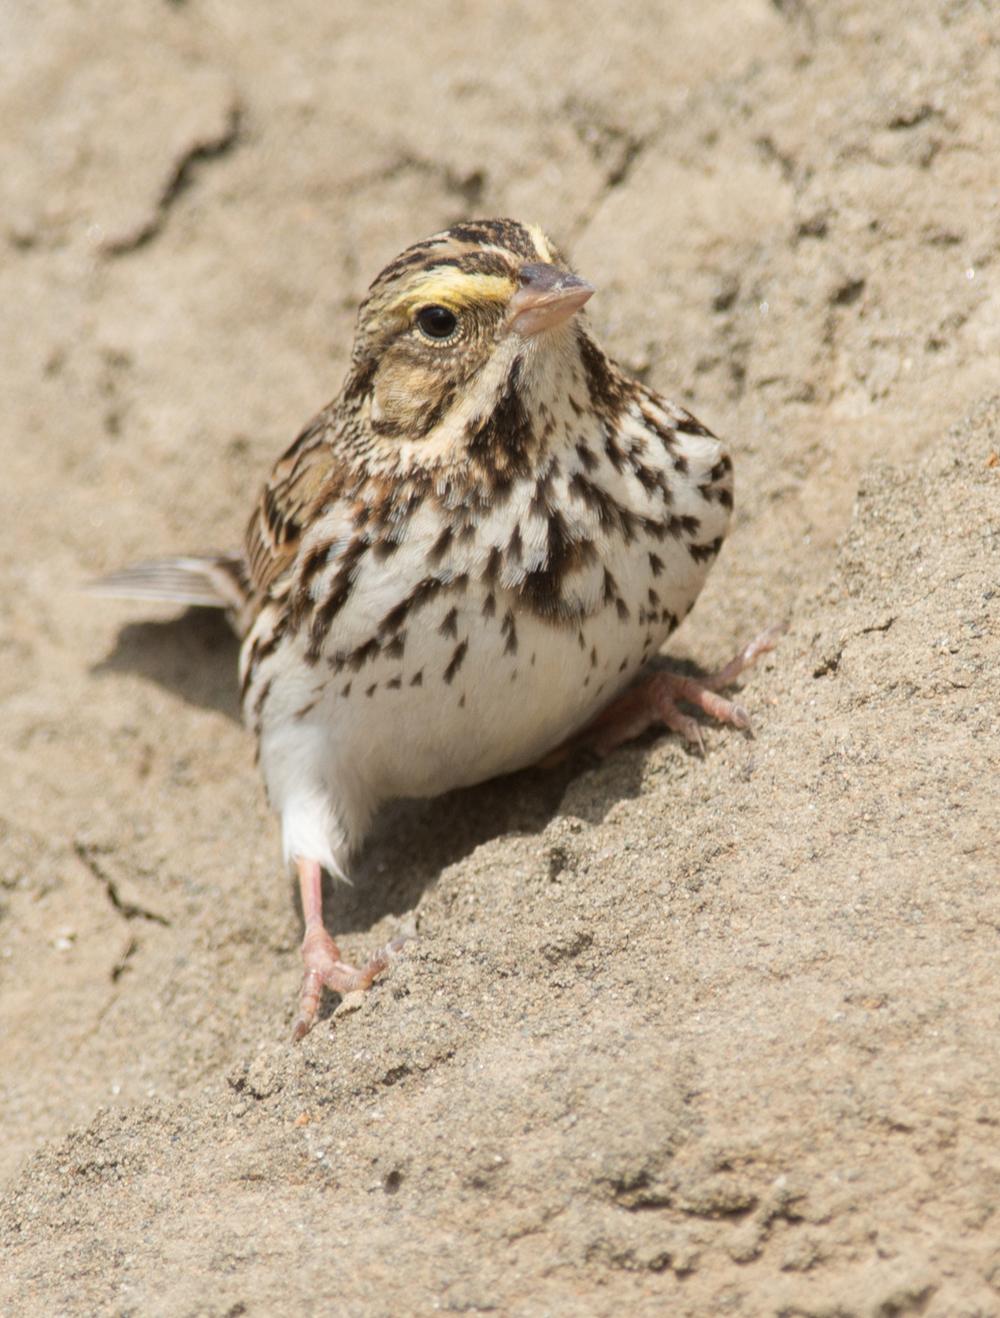 Savannah Sparrow (Passerculus sandwichensis)    500mm,  1/800,  f/6.3 , ISO250  1-4-14 11:27 Sunny